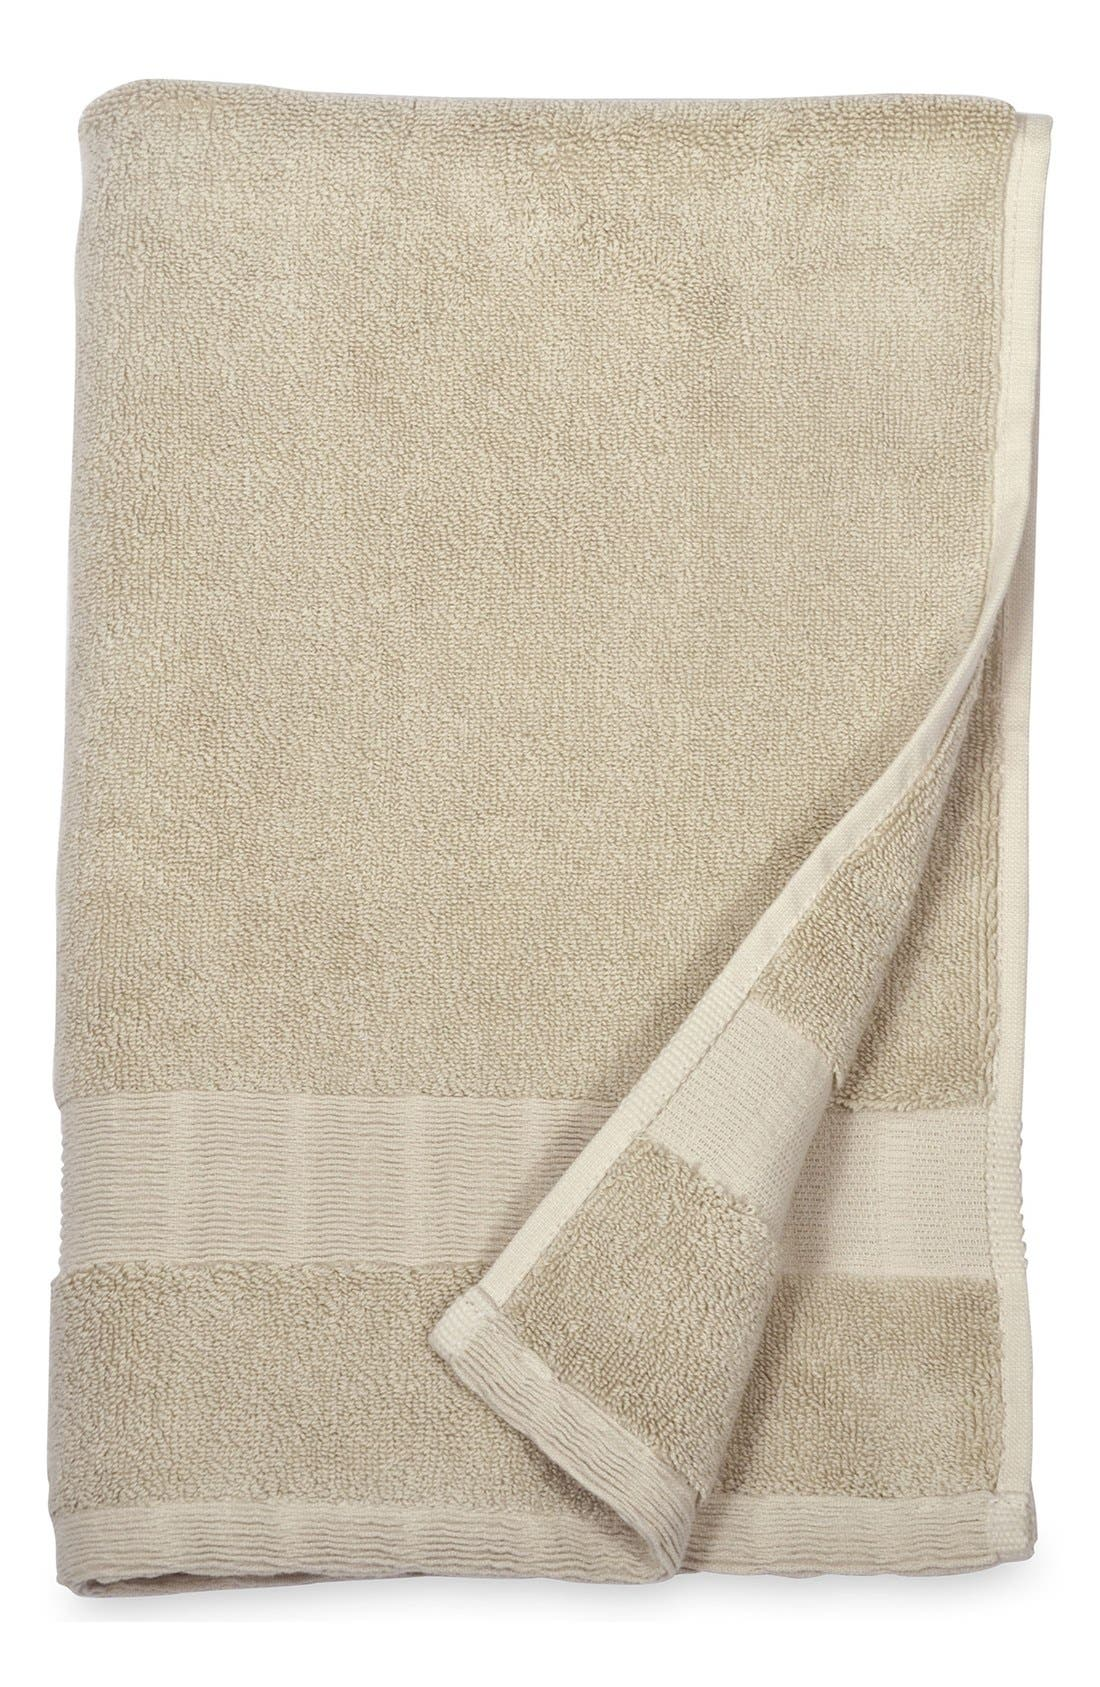 DKNY Mercer Hand Towel